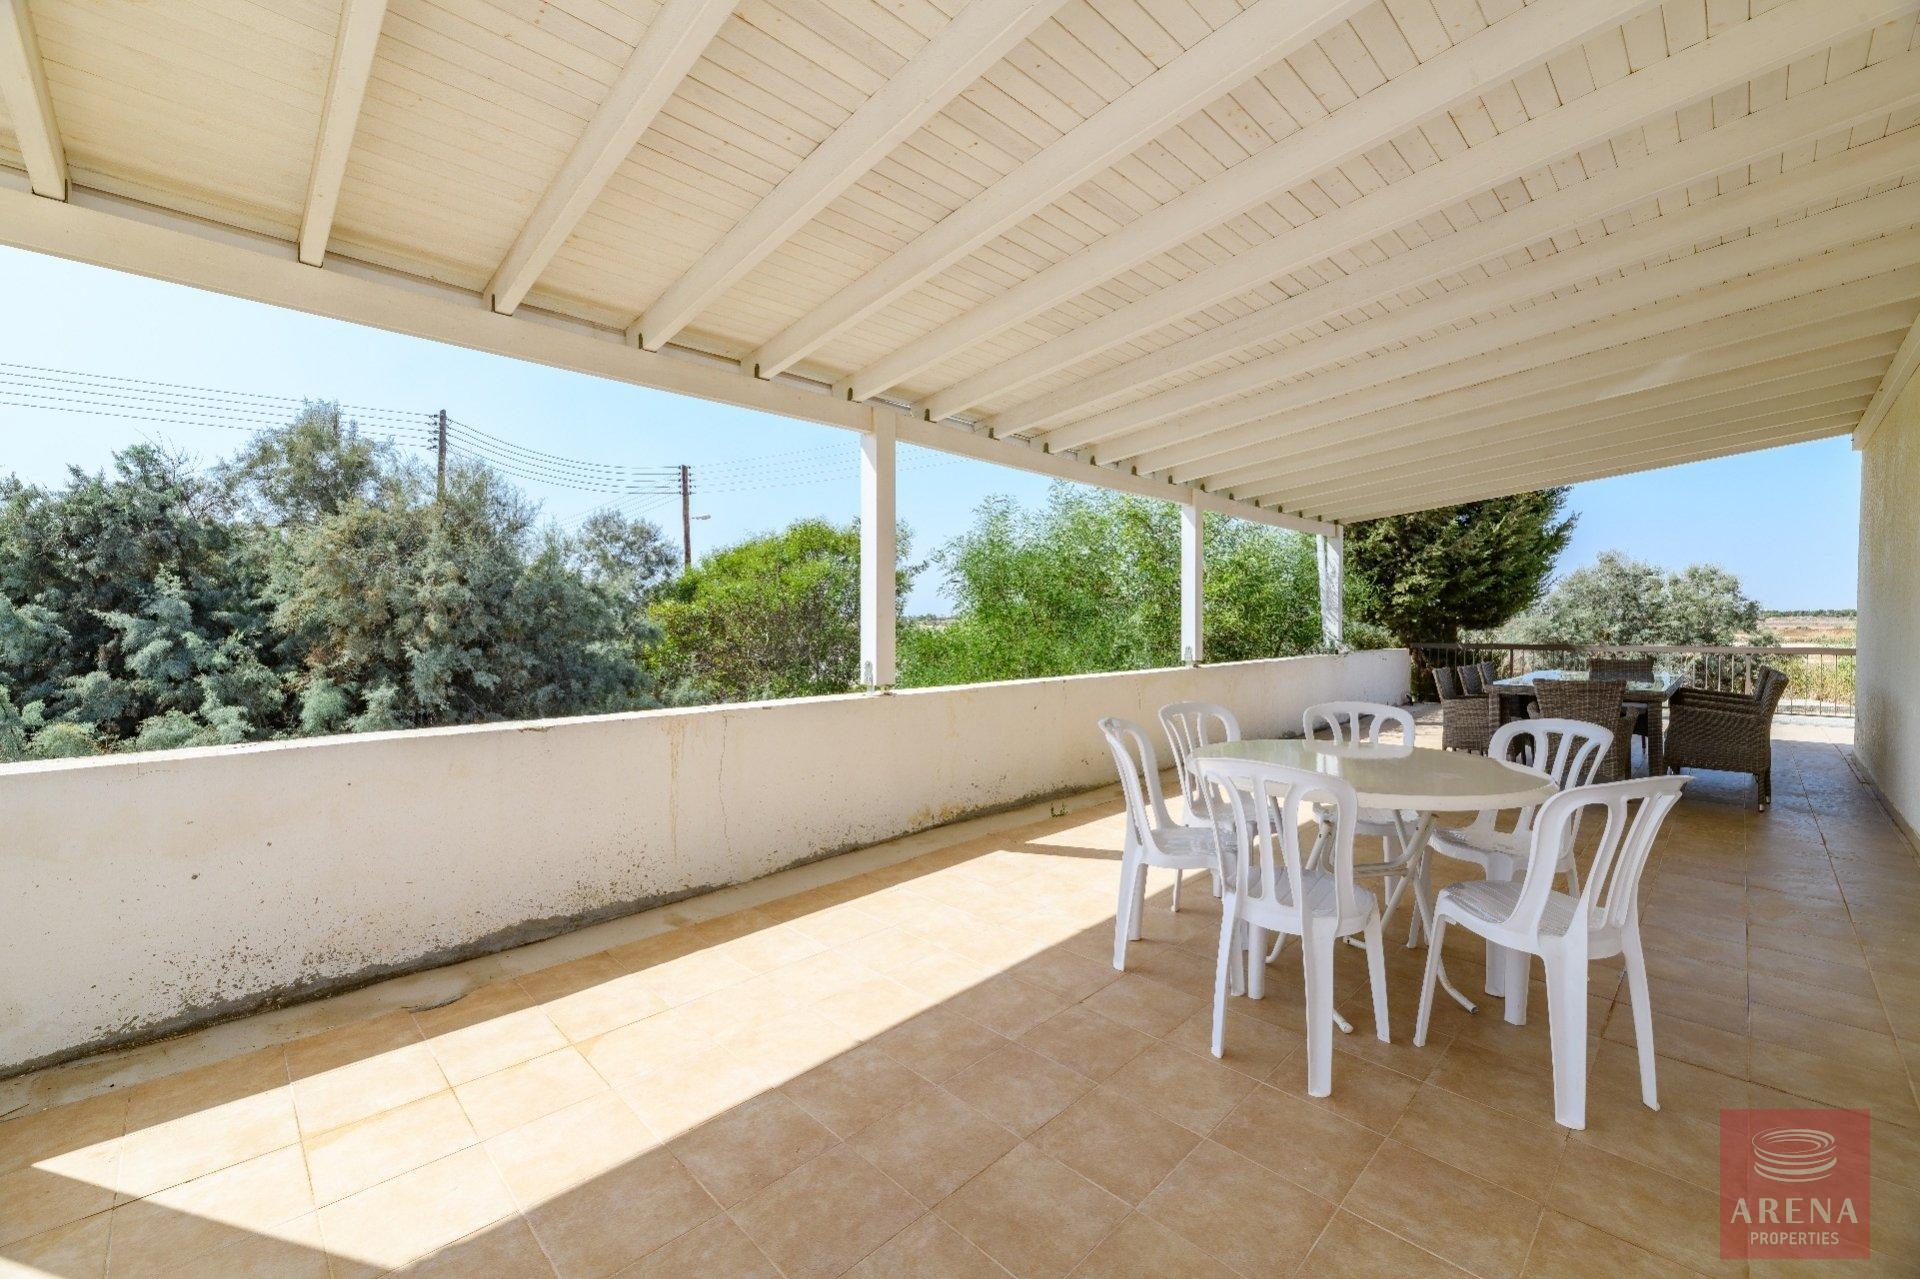 semi-detached house in paralimni for sale - veranda